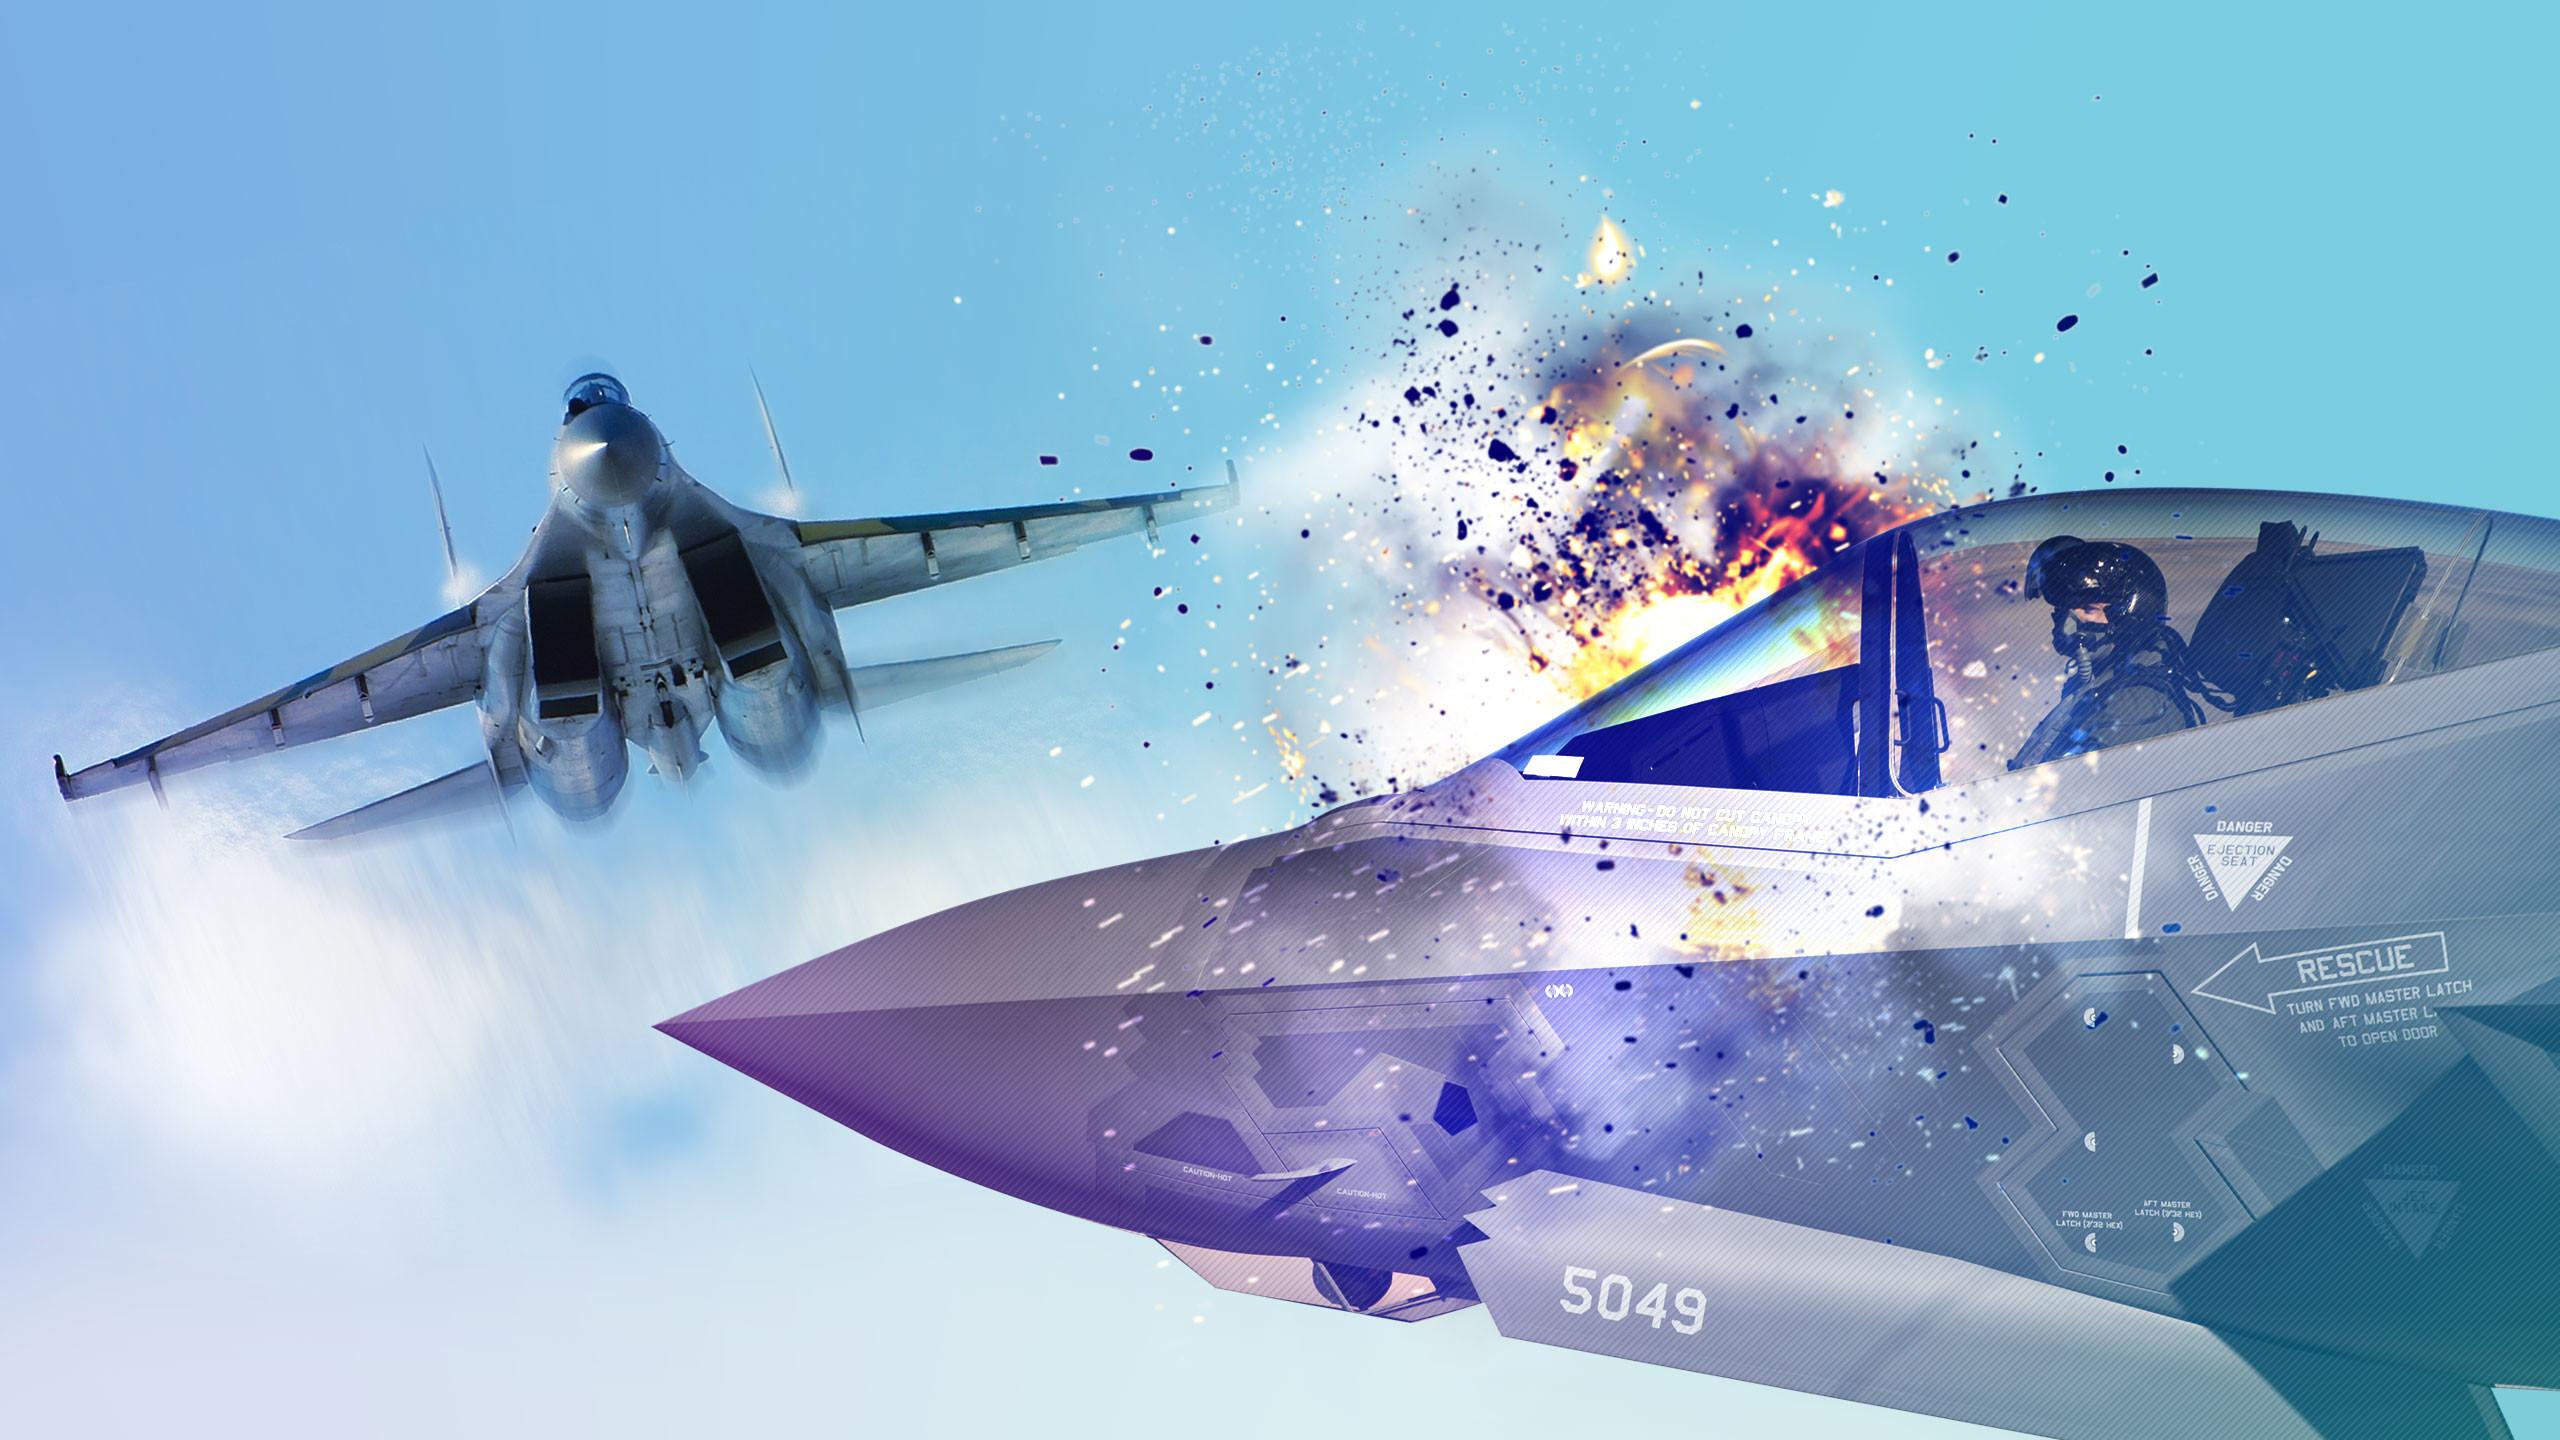 "<p>Фото: &copy;&nbsp;<span><a href=""https://commons.wikimedia.org/wiki/File:Sukhoi_Su-35S_at_MAKS-2011_airshow.jpg"" target=""_blank"" data-noload="""" data-ved=""2ahUKEwjy_ObN_t_dAhWOt4sKHcgNAYwQjB16BAgBEAQ"">Wikimedia Commons</a>,&nbsp;<a href=""https://www.nellis.af.mil/News/Article/664803/f-35-arrival-begins-new-era-at-usafws/"" target=""_blank"" data-noload="""" data-ved=""2ahUKEwjahKXFguDdAhXJk4sKHQFSA0YQjB16BAgBEAQ"">Nellis Air Force Base - Air Force</a></span></p>"